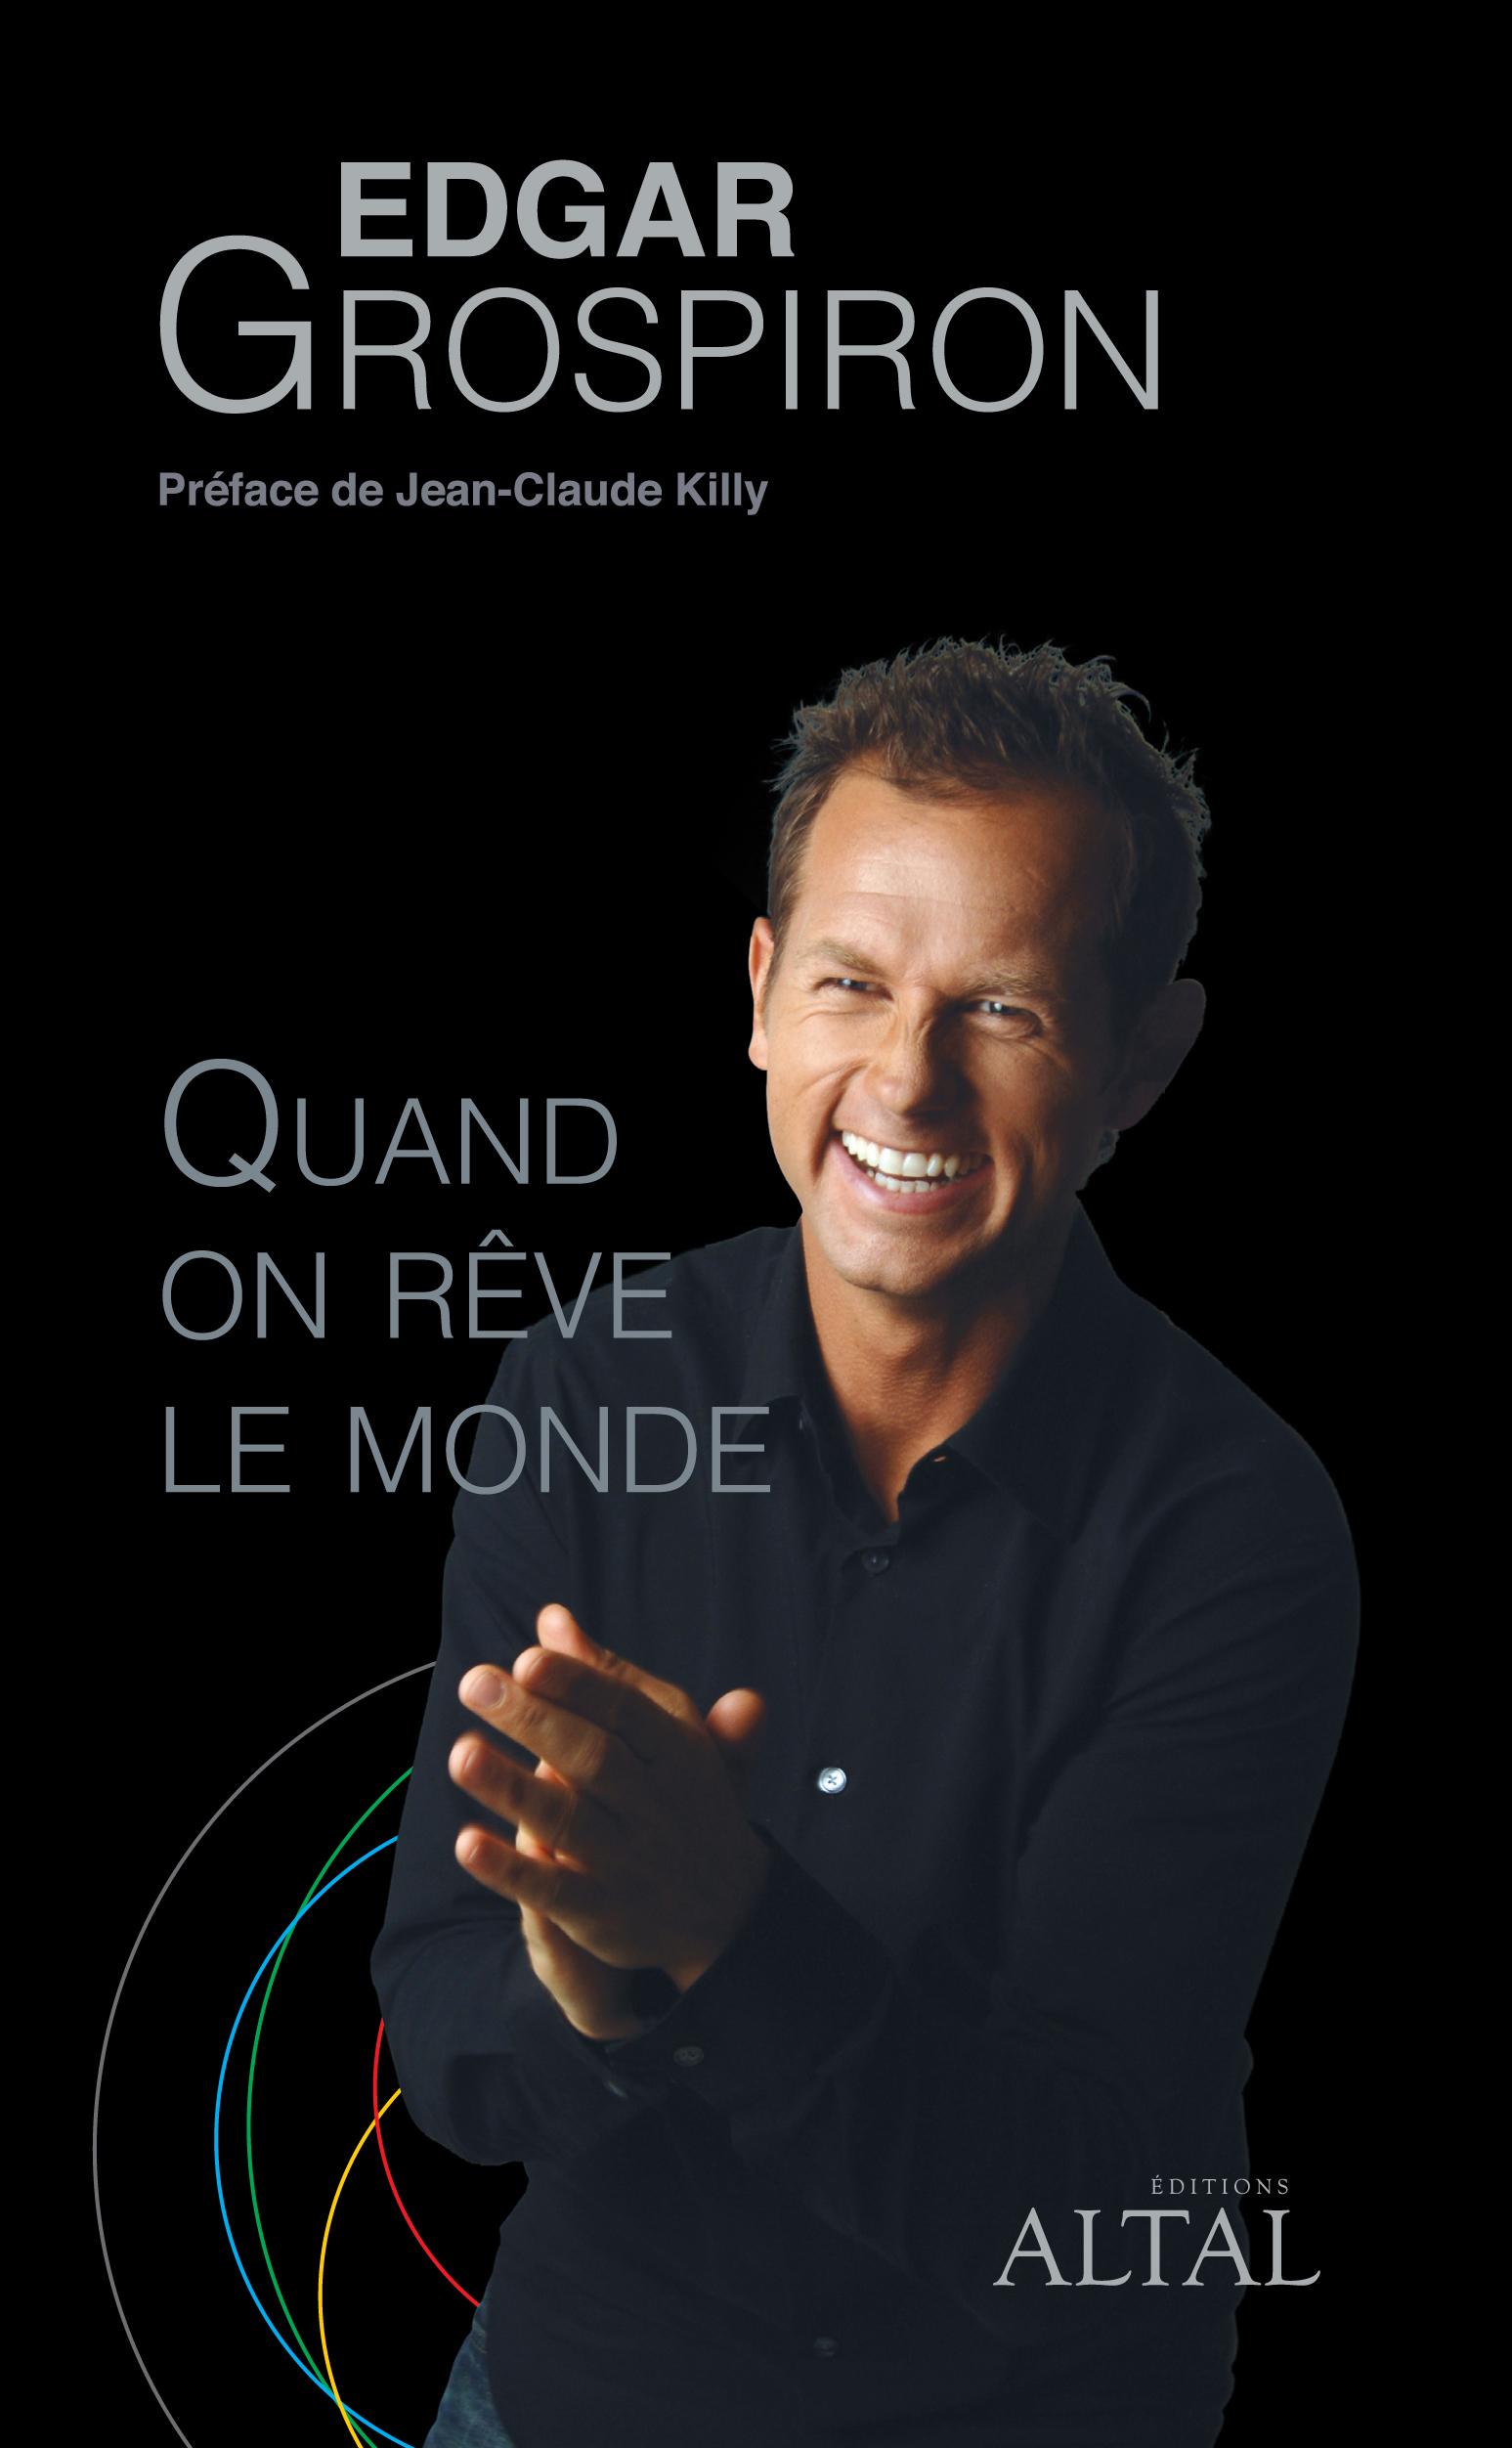 QUAND ON REVE LE MONDE...